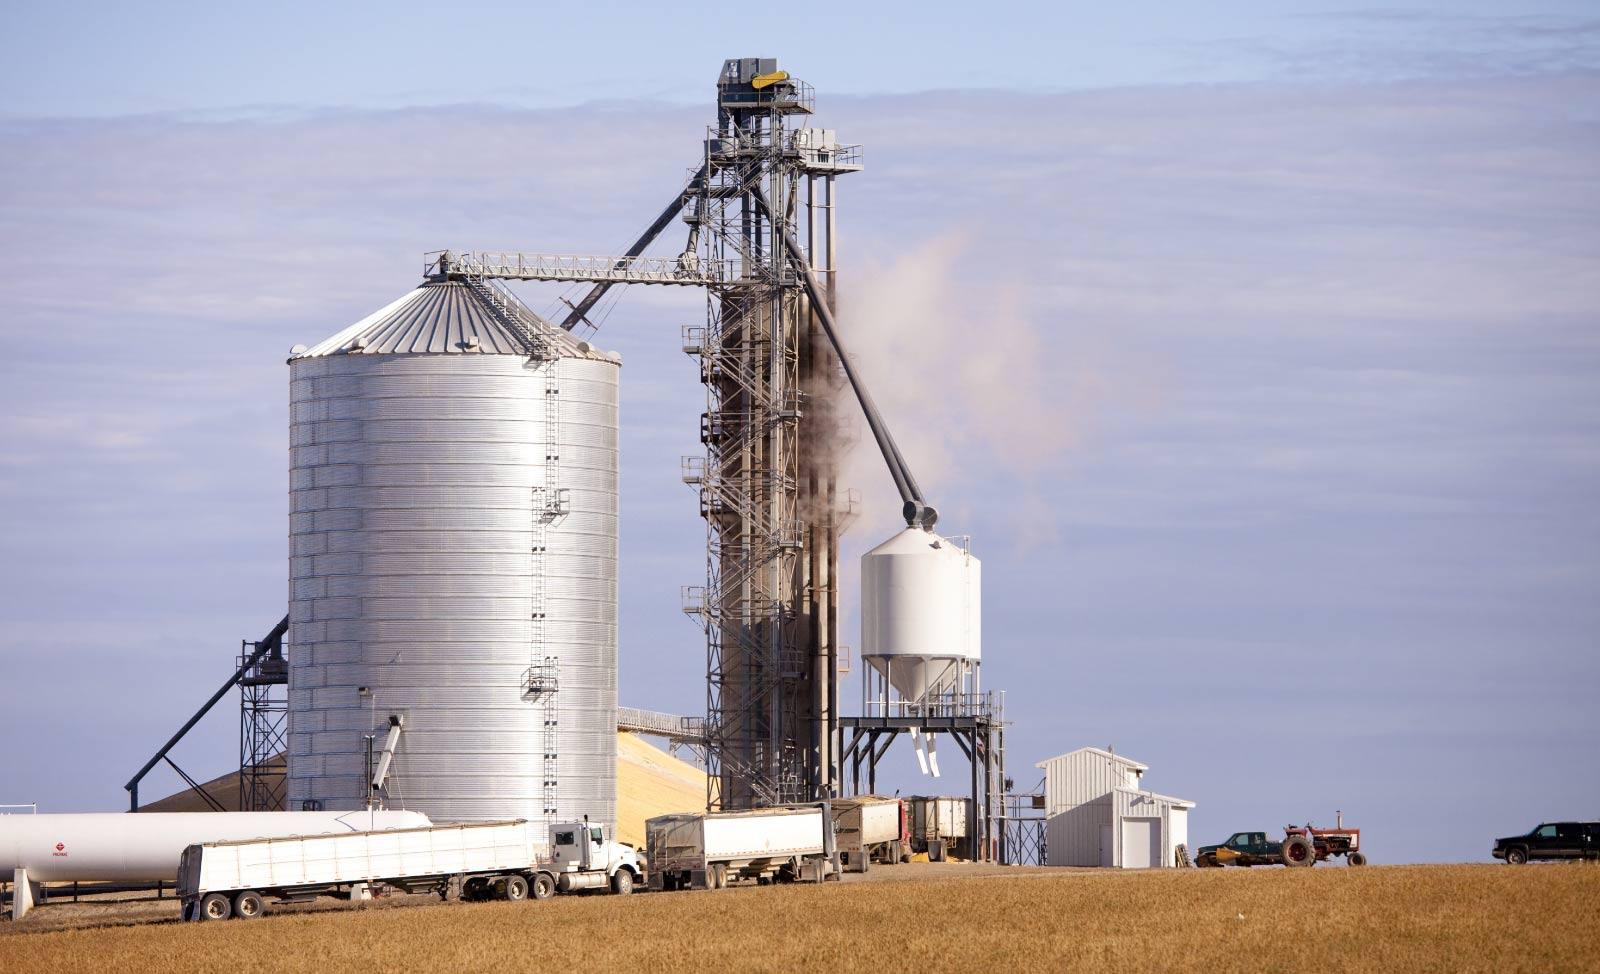 grain-elevator-emergence-1600x974